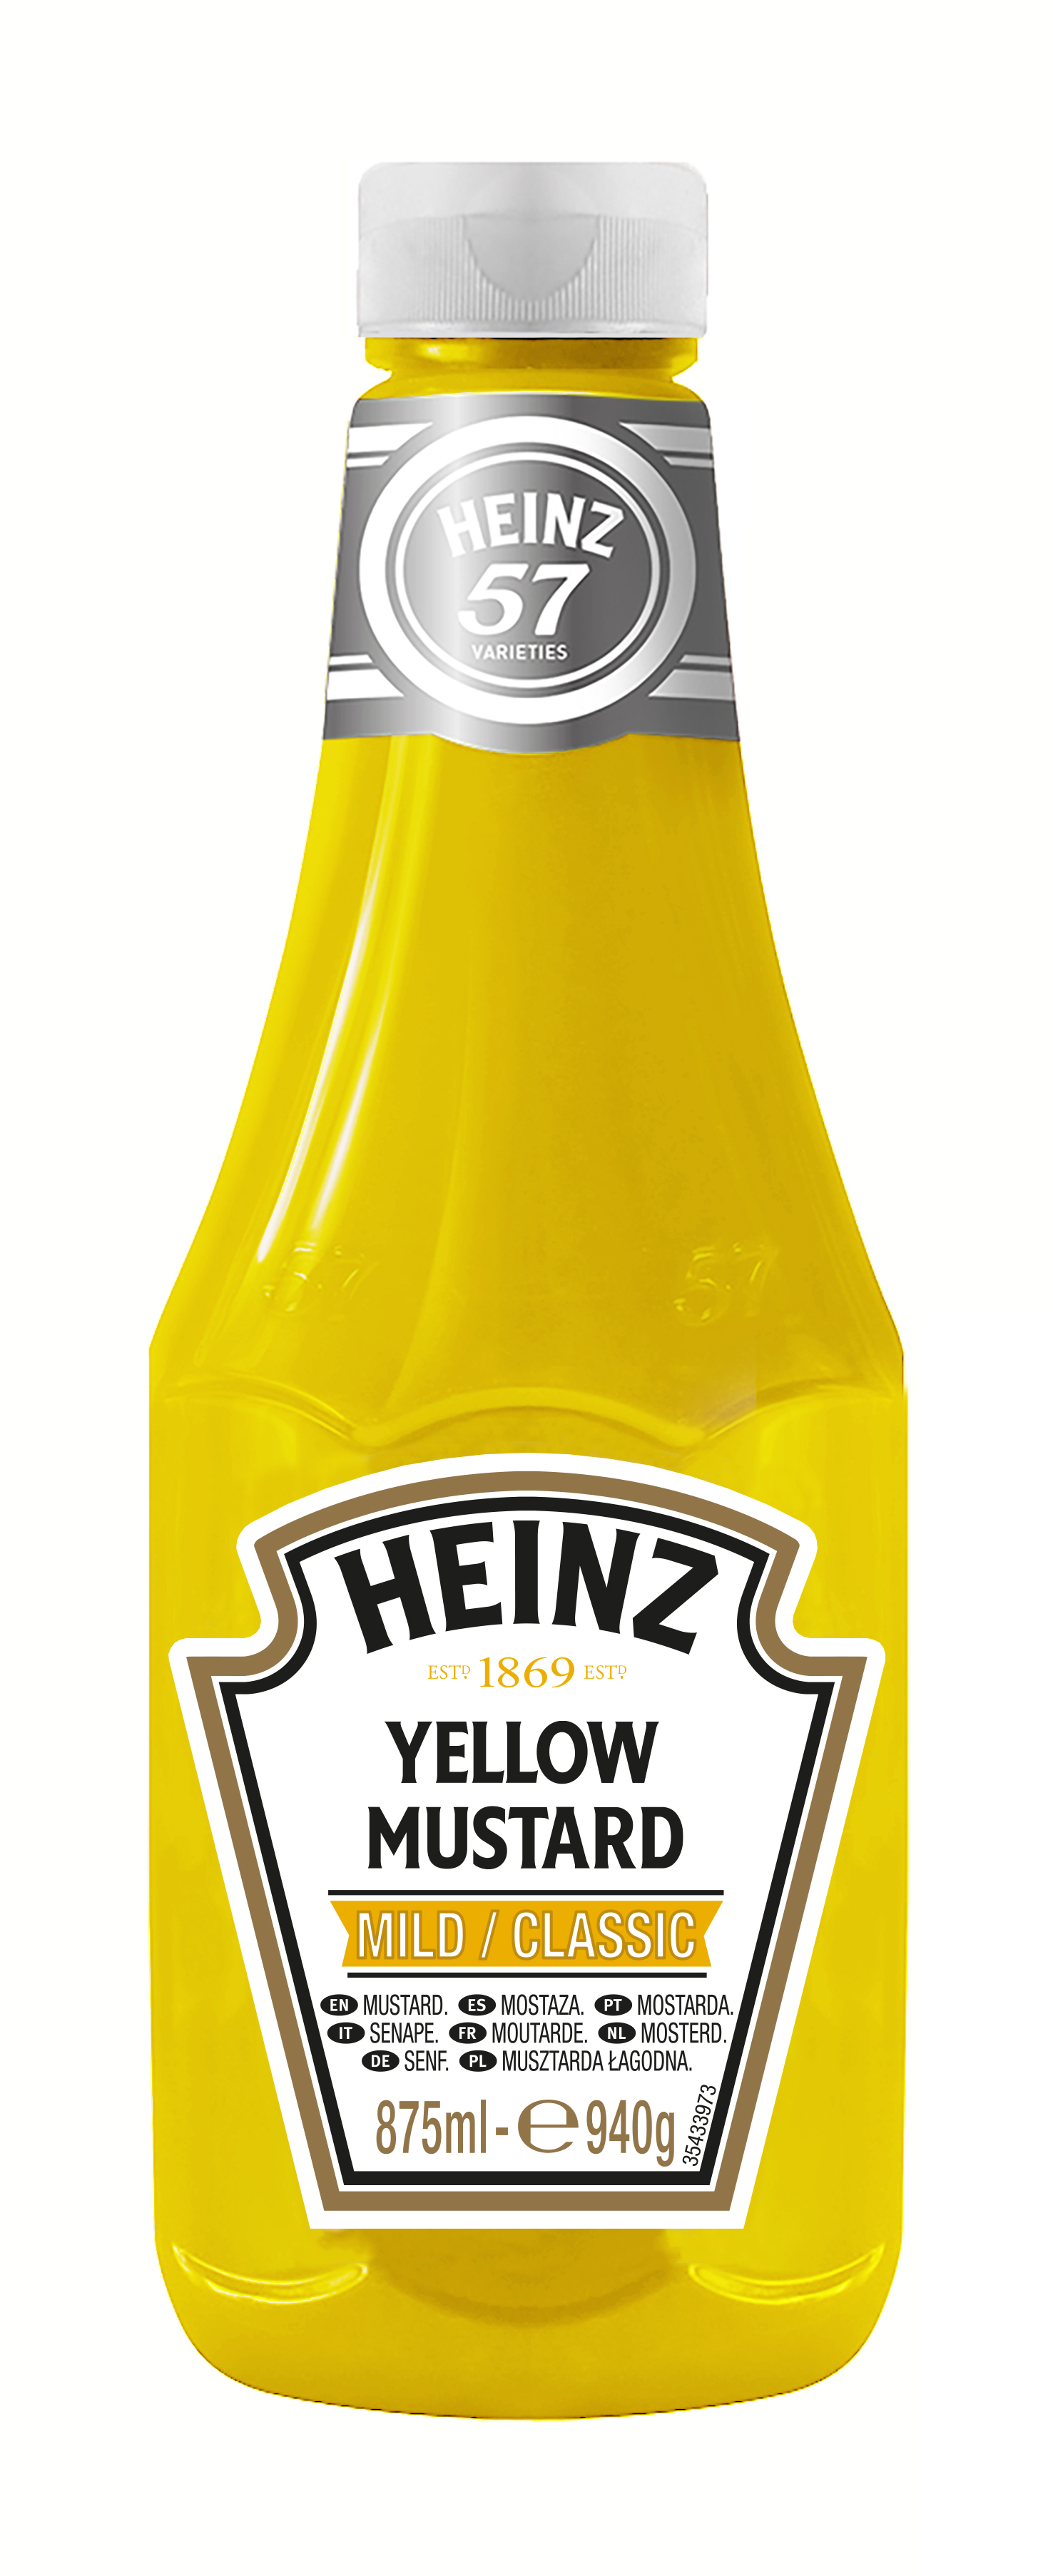 Heinz YellowMustard 875ml image